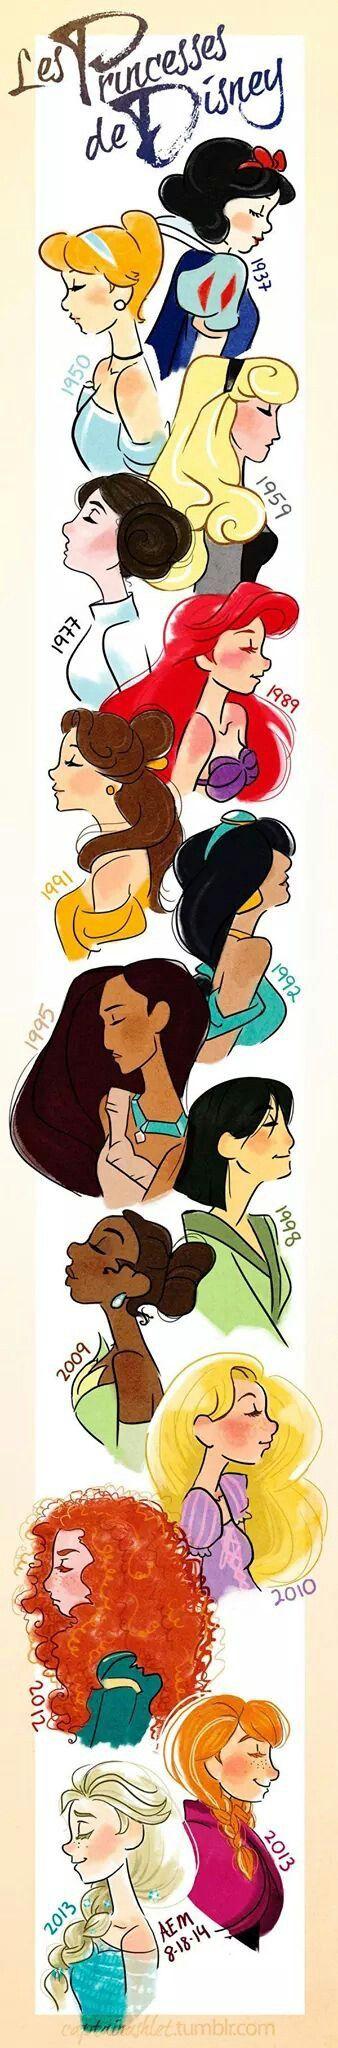 Las princesas de Disney